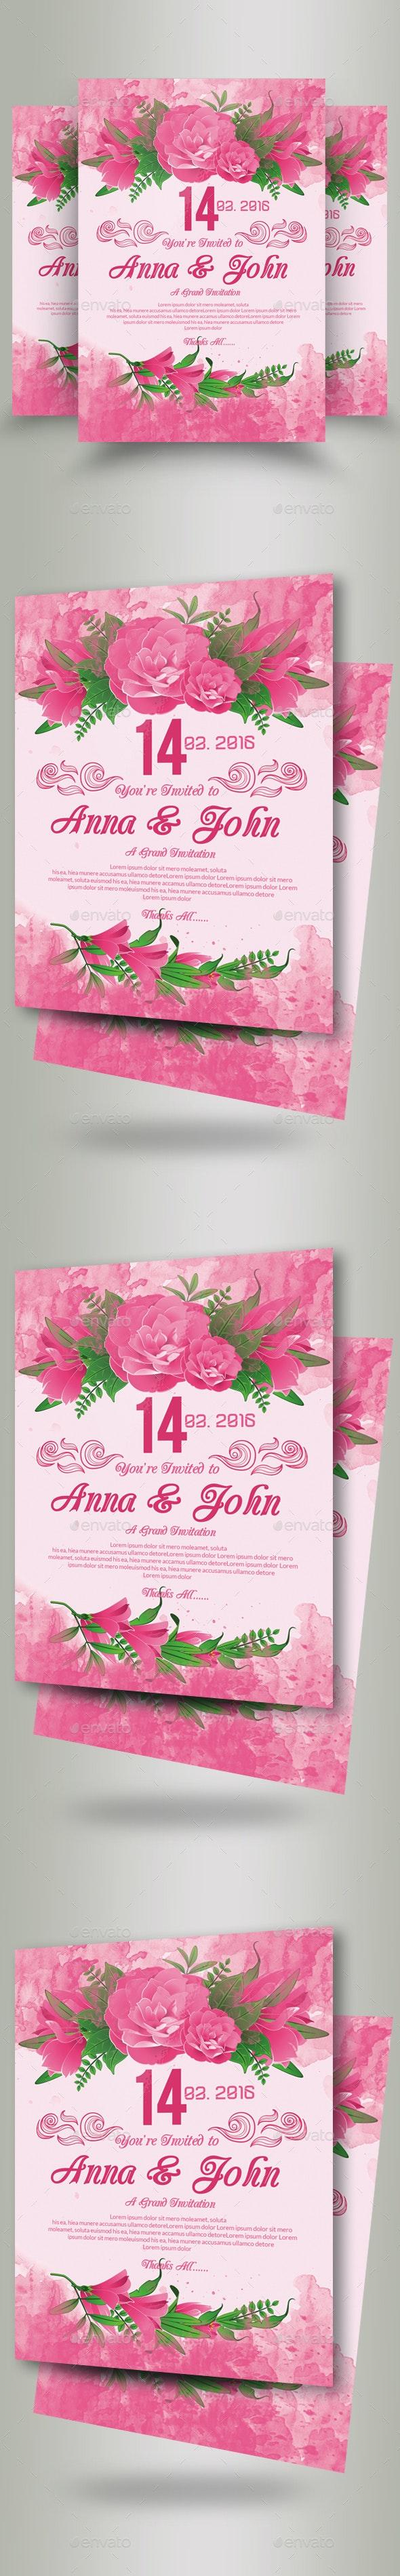 Wedding Invitation Flyer Template - Flyers Print Templates